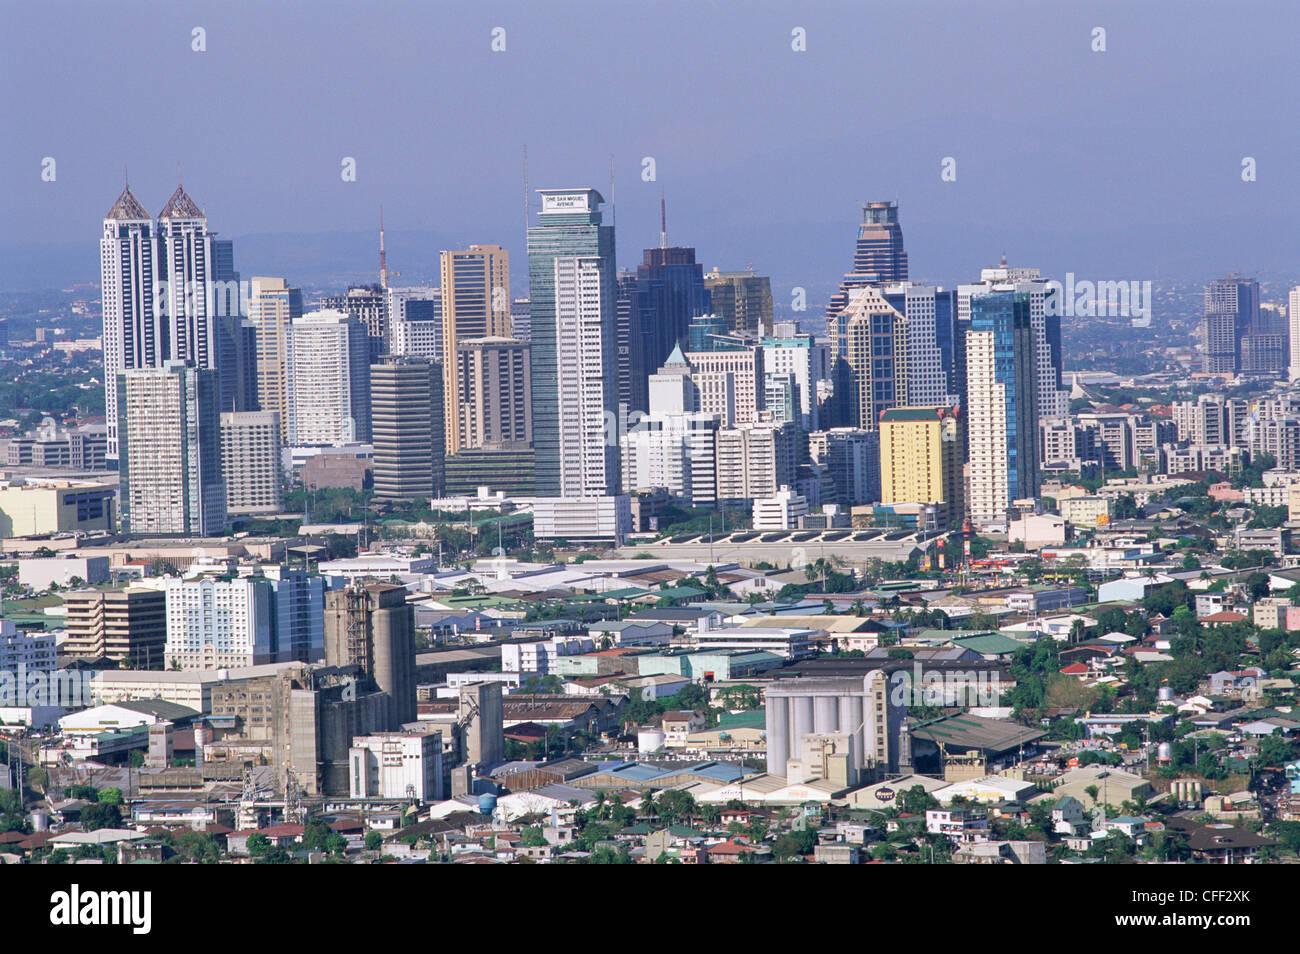 Philippines, Manila, Pasig City Business Area Skyline - Stock Image